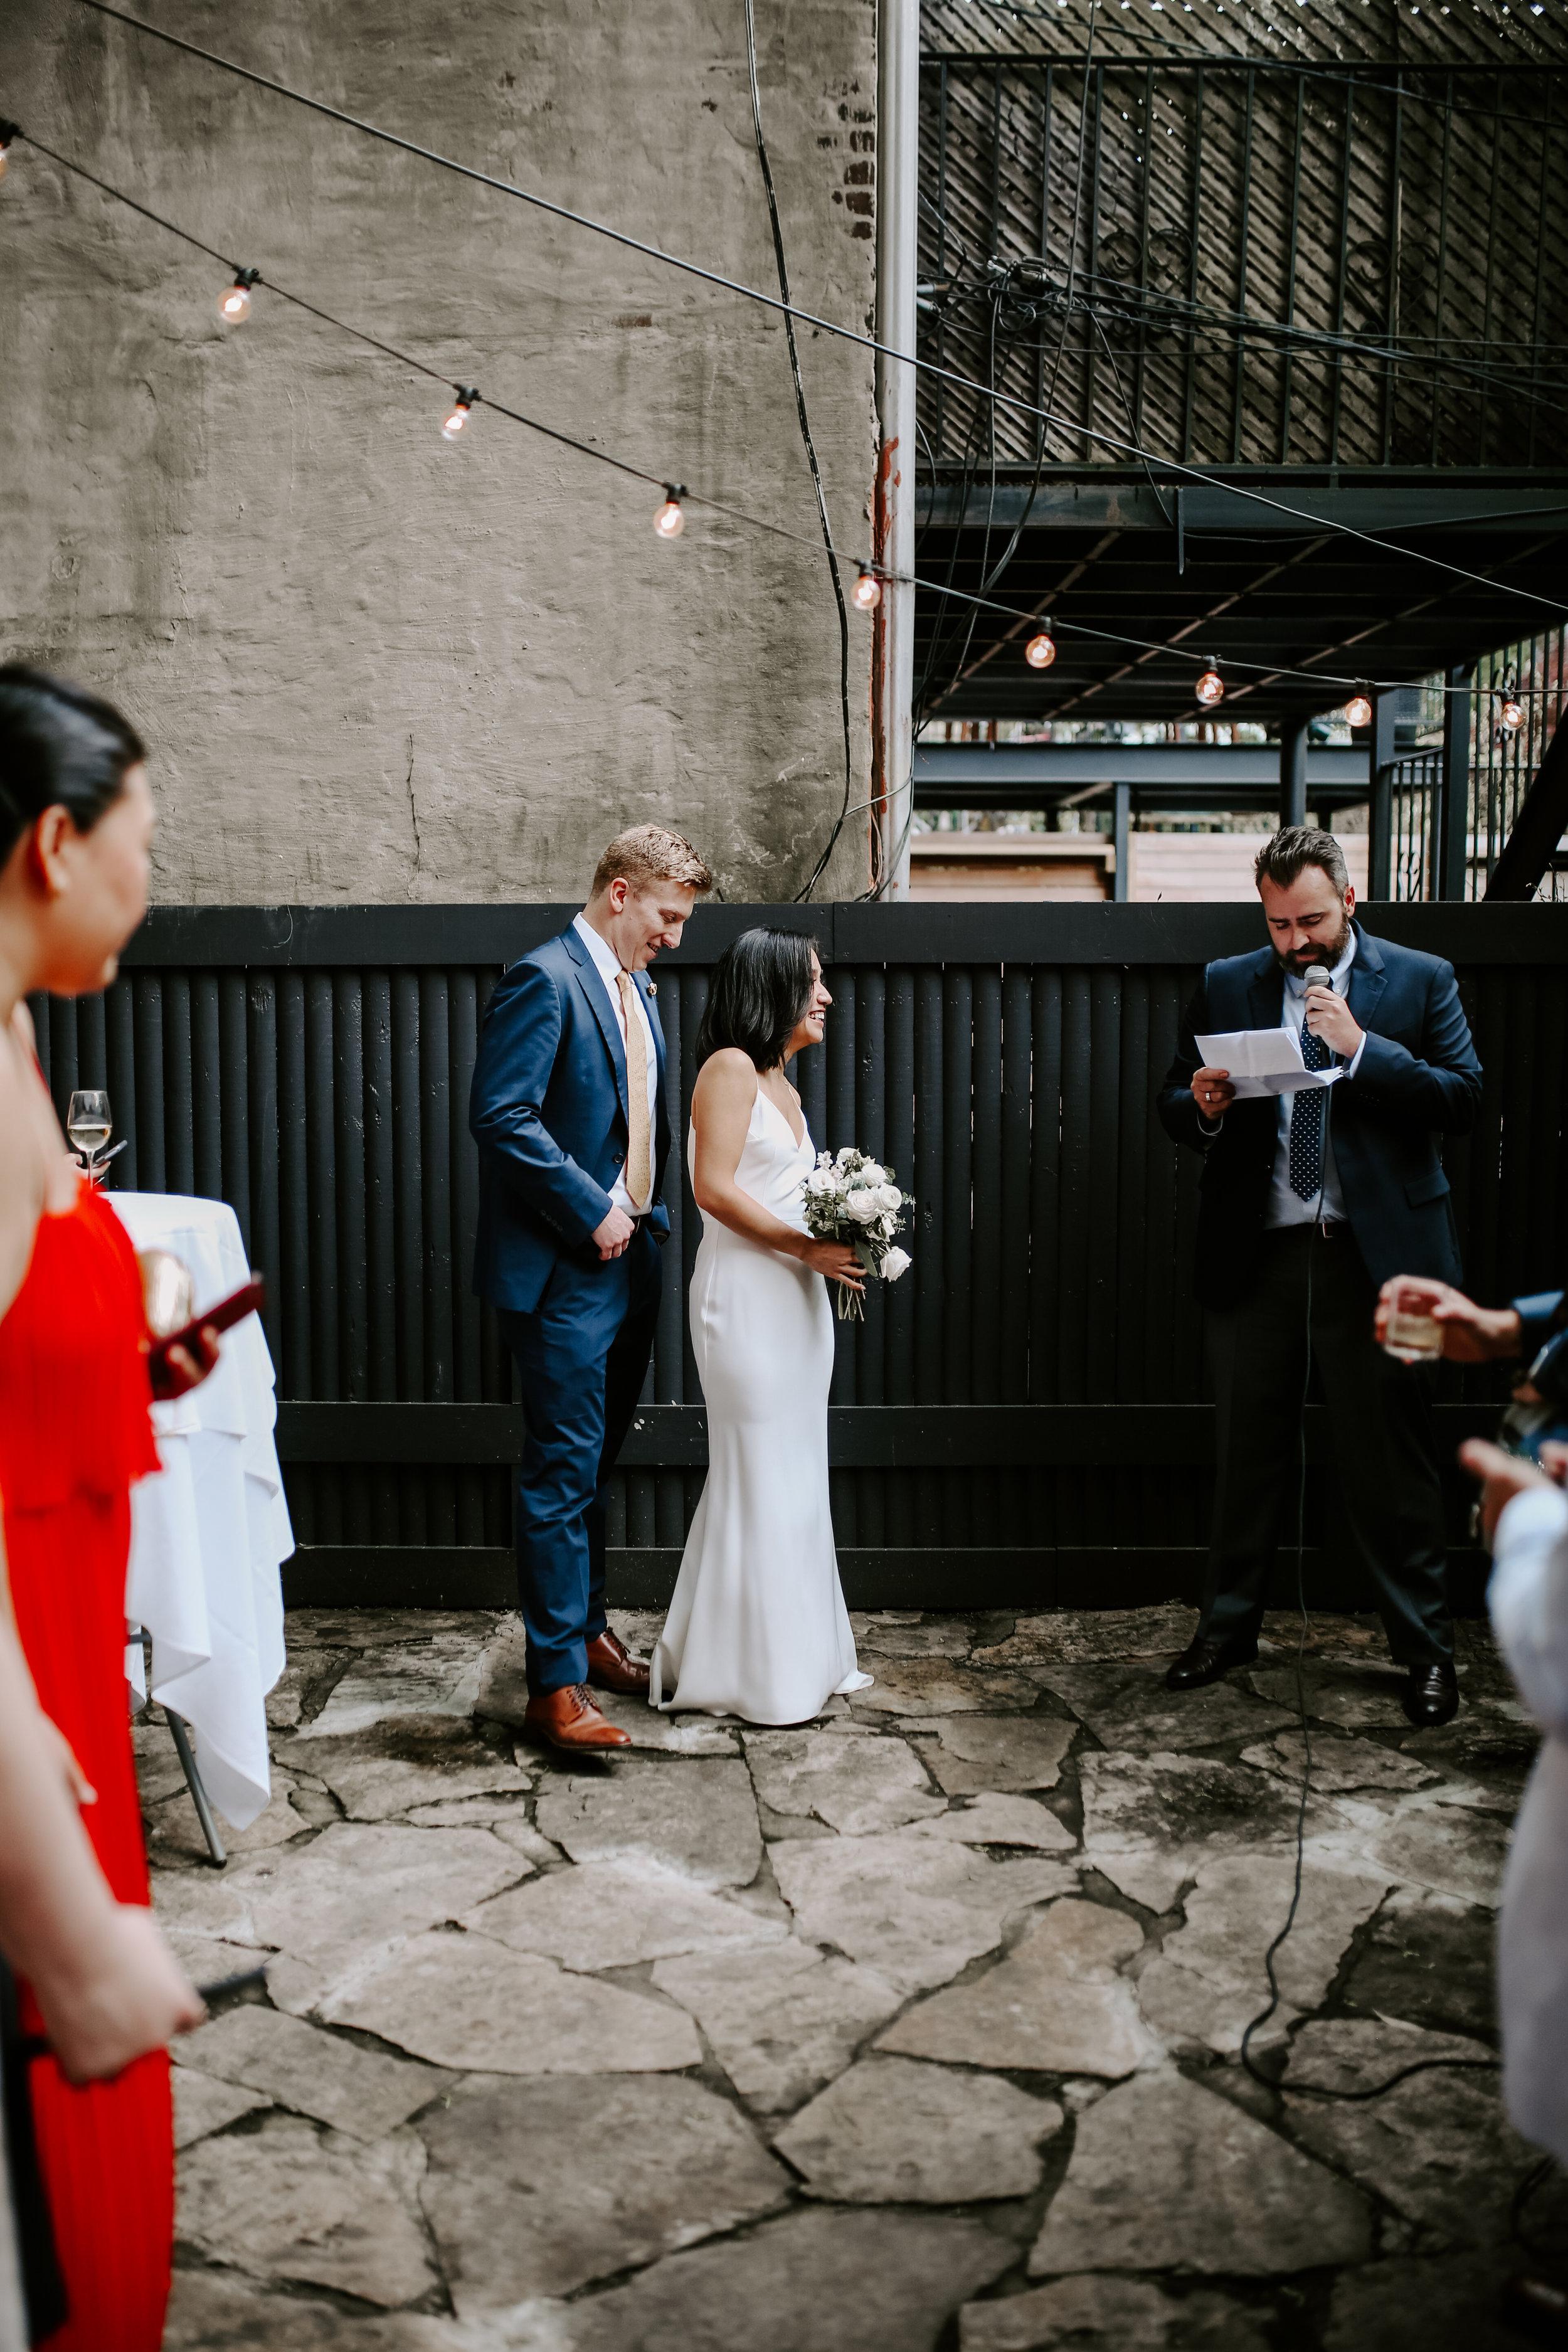 TheNichols_Married_2019-153.jpg